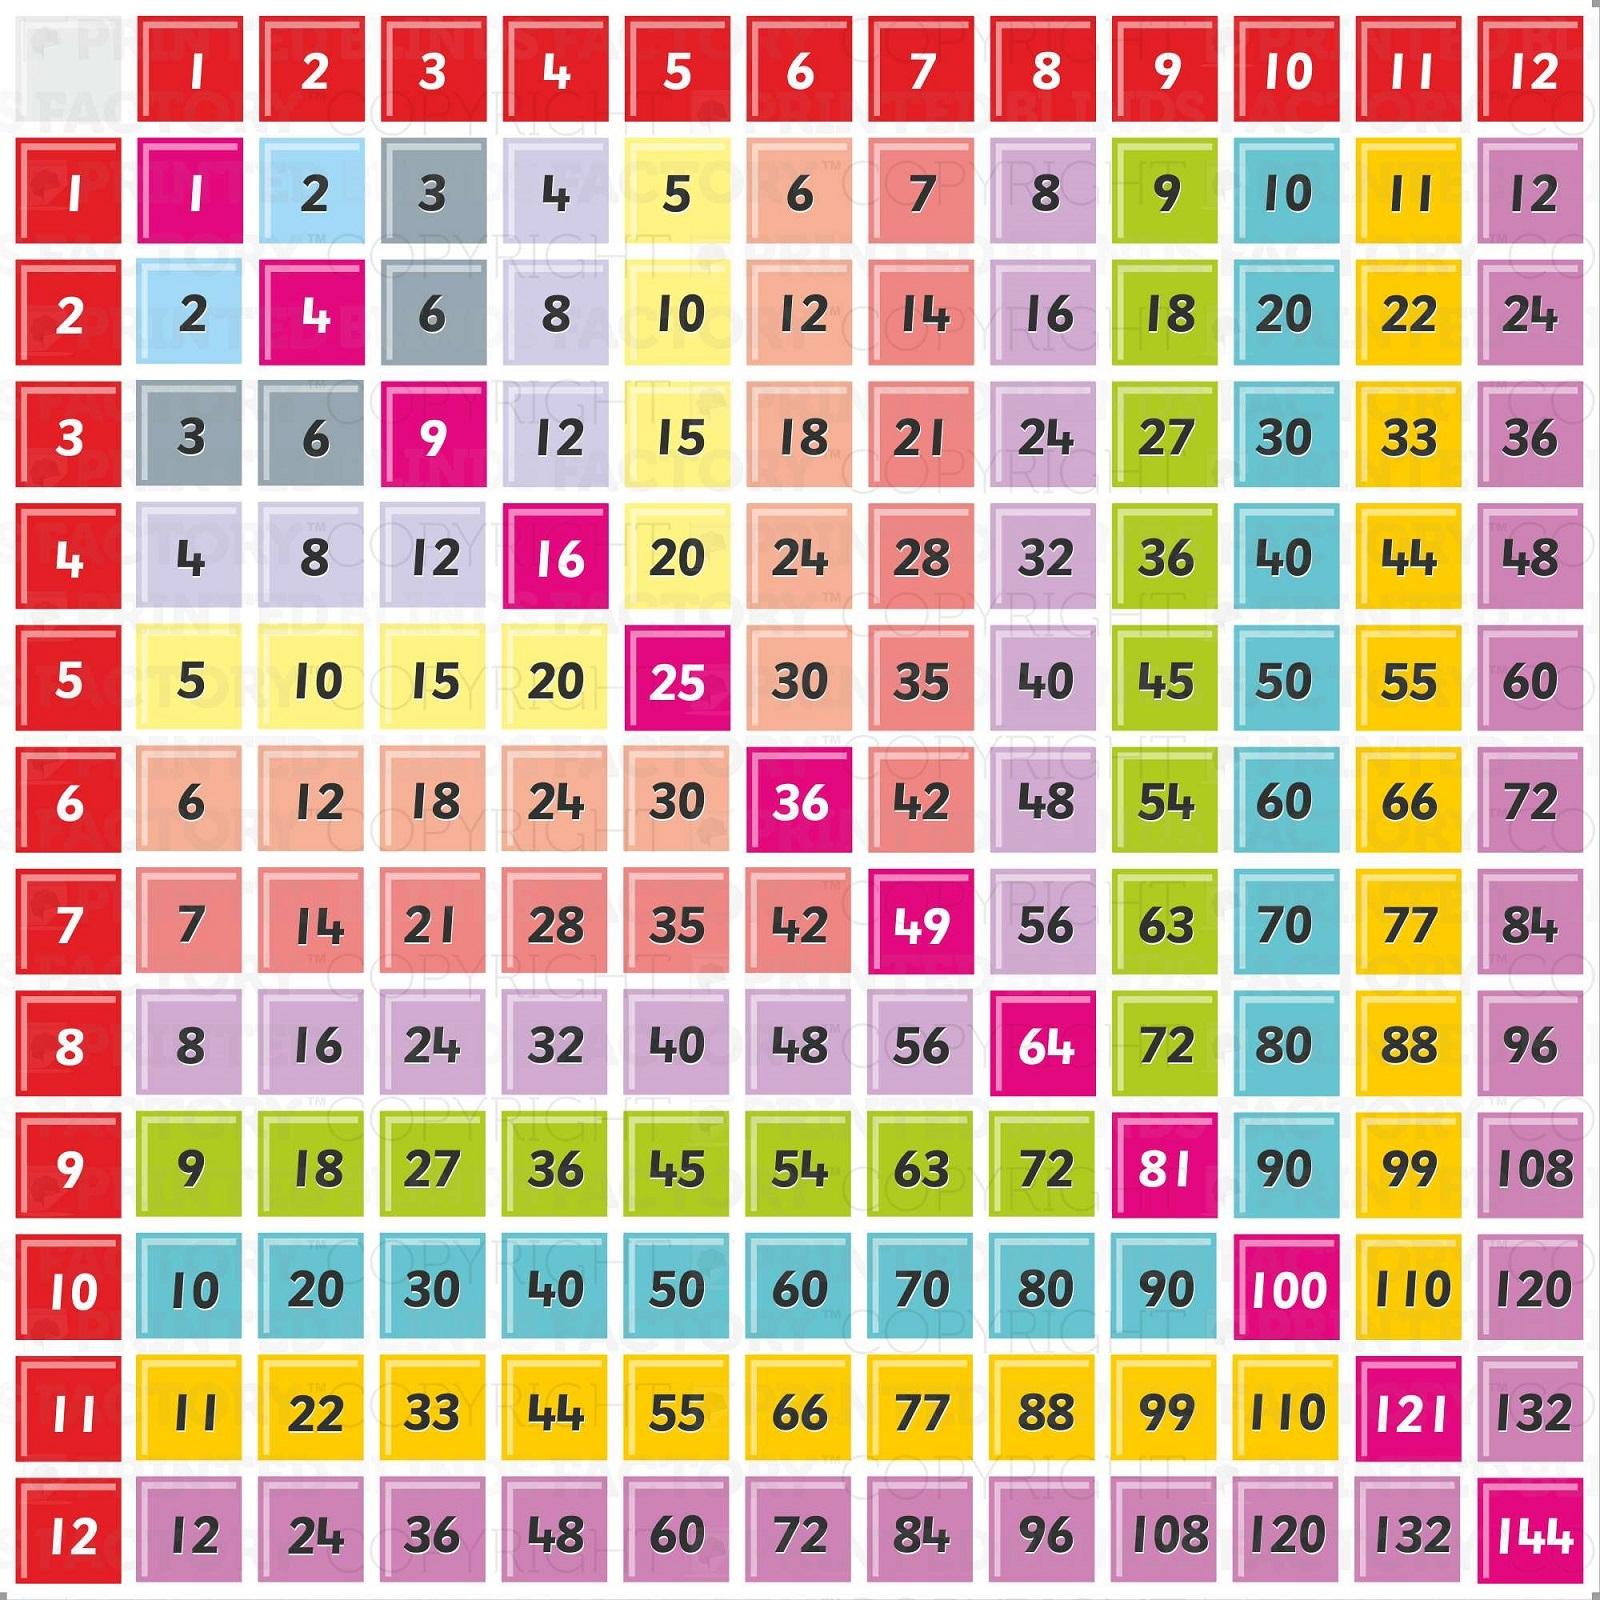 Multiplication Table Worksheets 1 12 | Printable Worksheets in Printable Multiplication Table 0-10